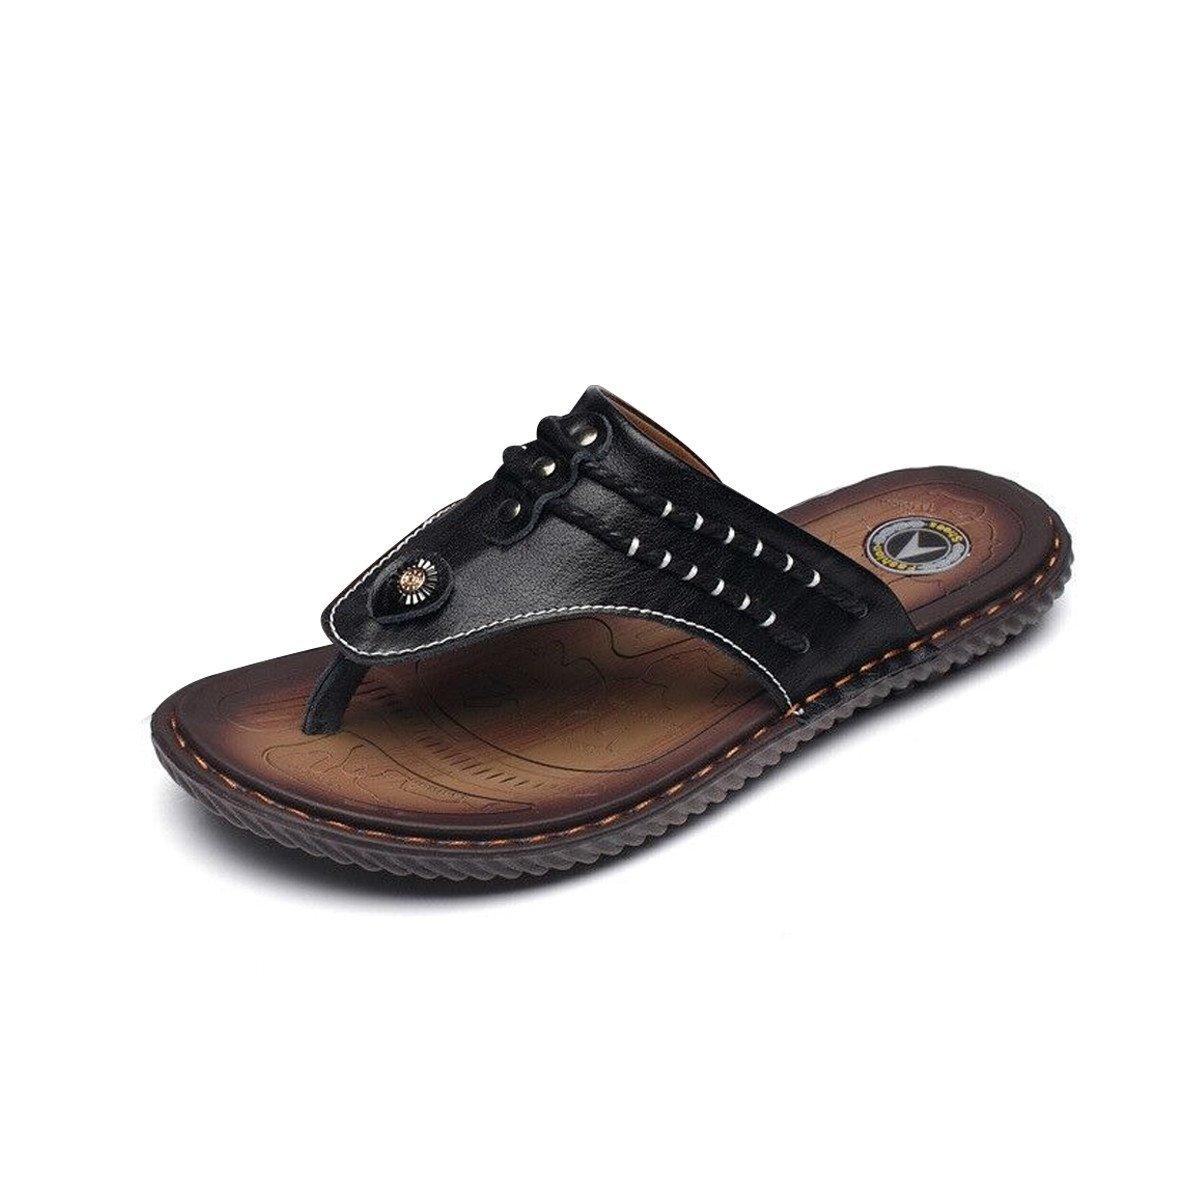 Gracosy Flip Flops, Unisex Zehentrenner Flache Hausschuhe Pantoletten Sommer Schuhe Slippers Weich Anti-Rutsch T-Strap Sandalen fuuml;r Herren Damenr  43 EU|Schwarz